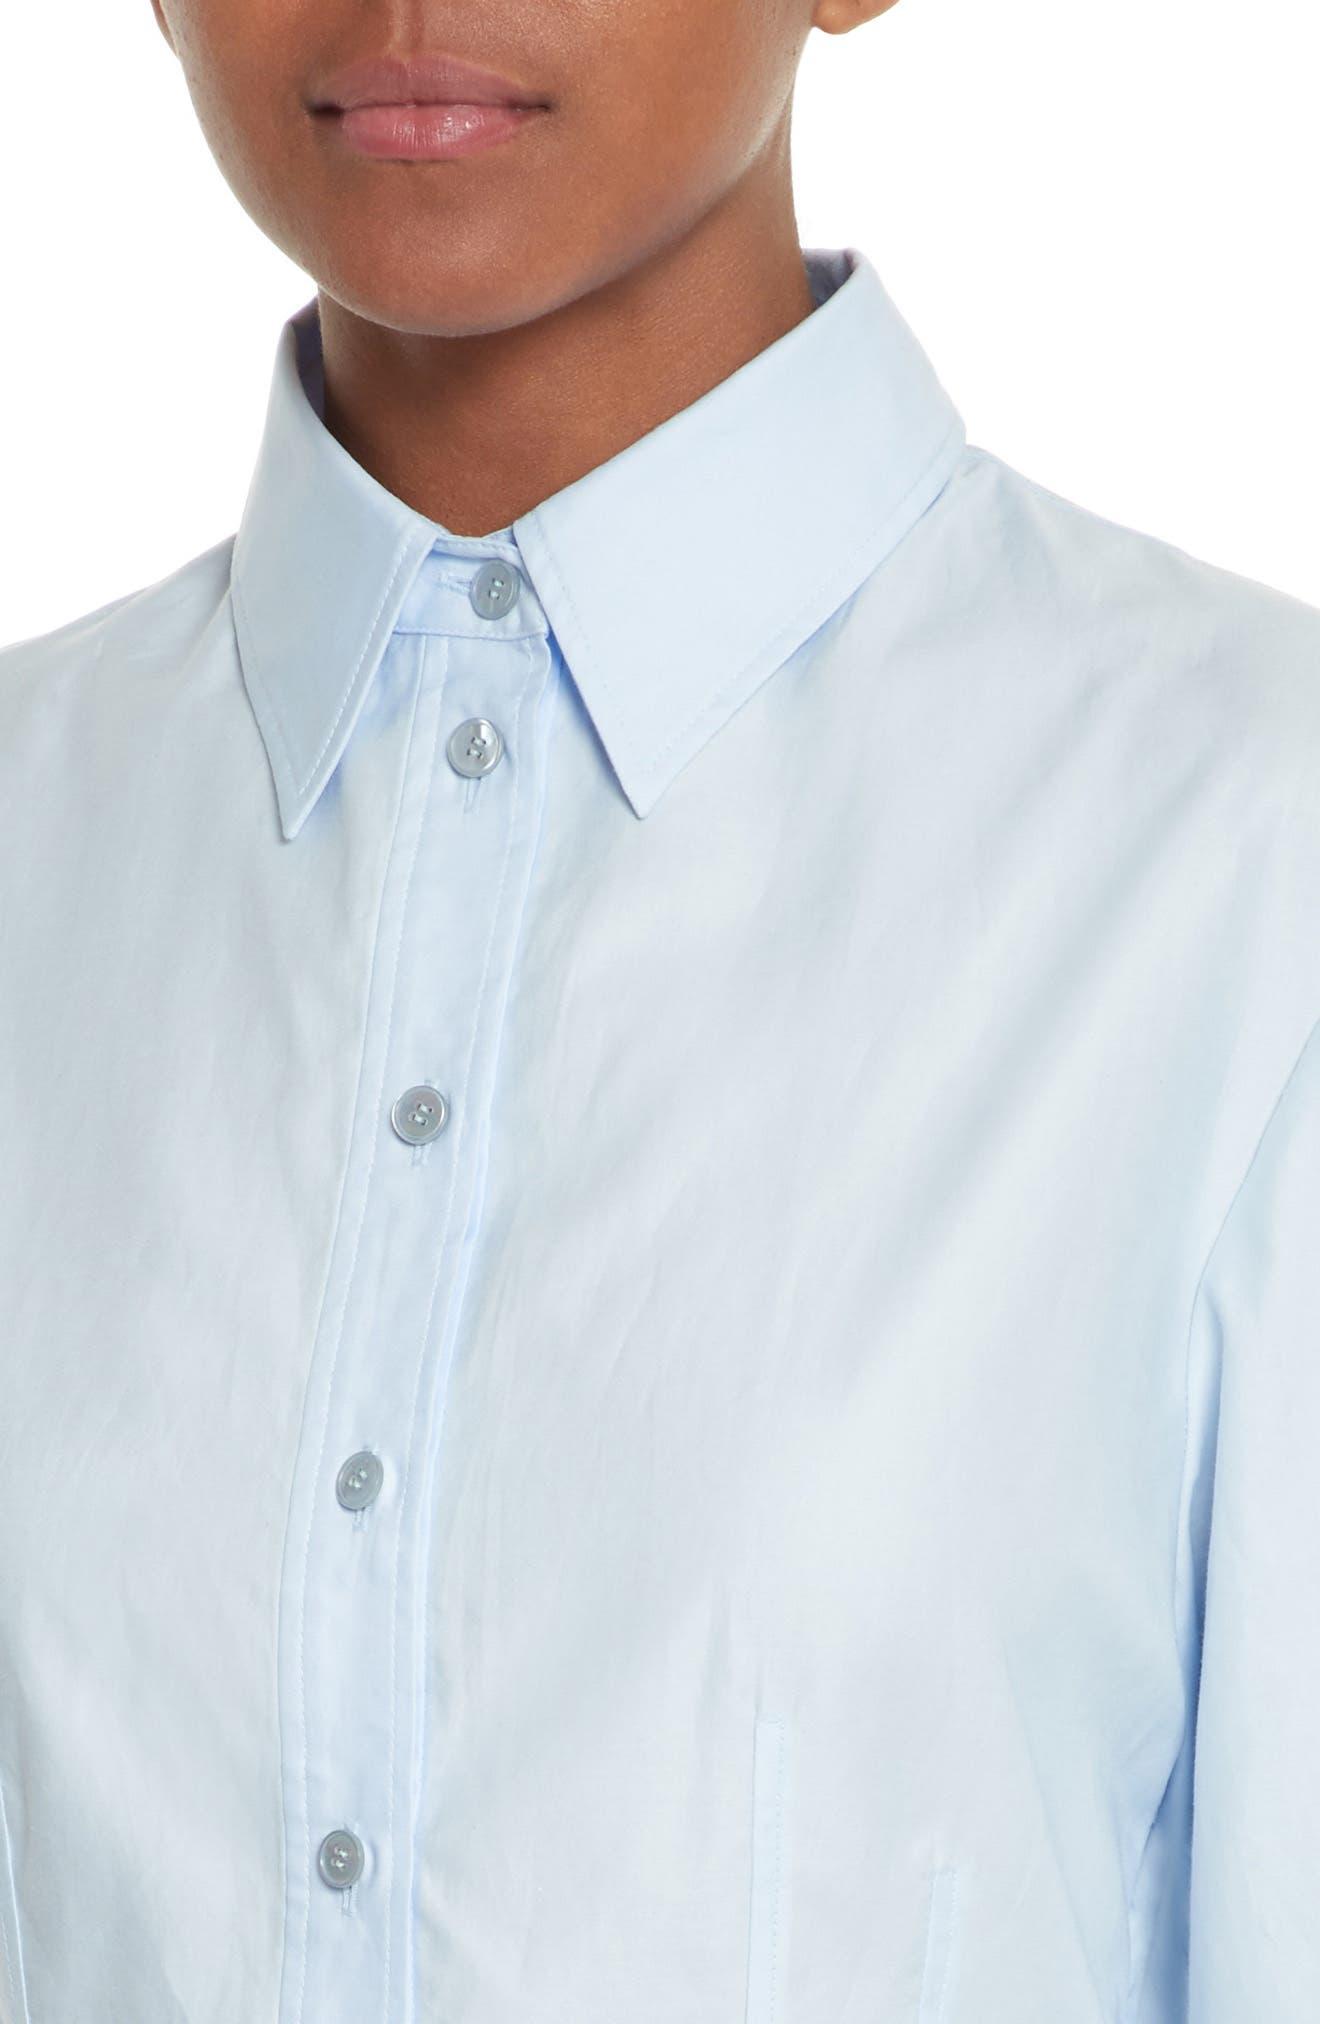 Carina Cotton Poplin Shirtdress,                             Alternate thumbnail 4, color,                             Oxford Blue